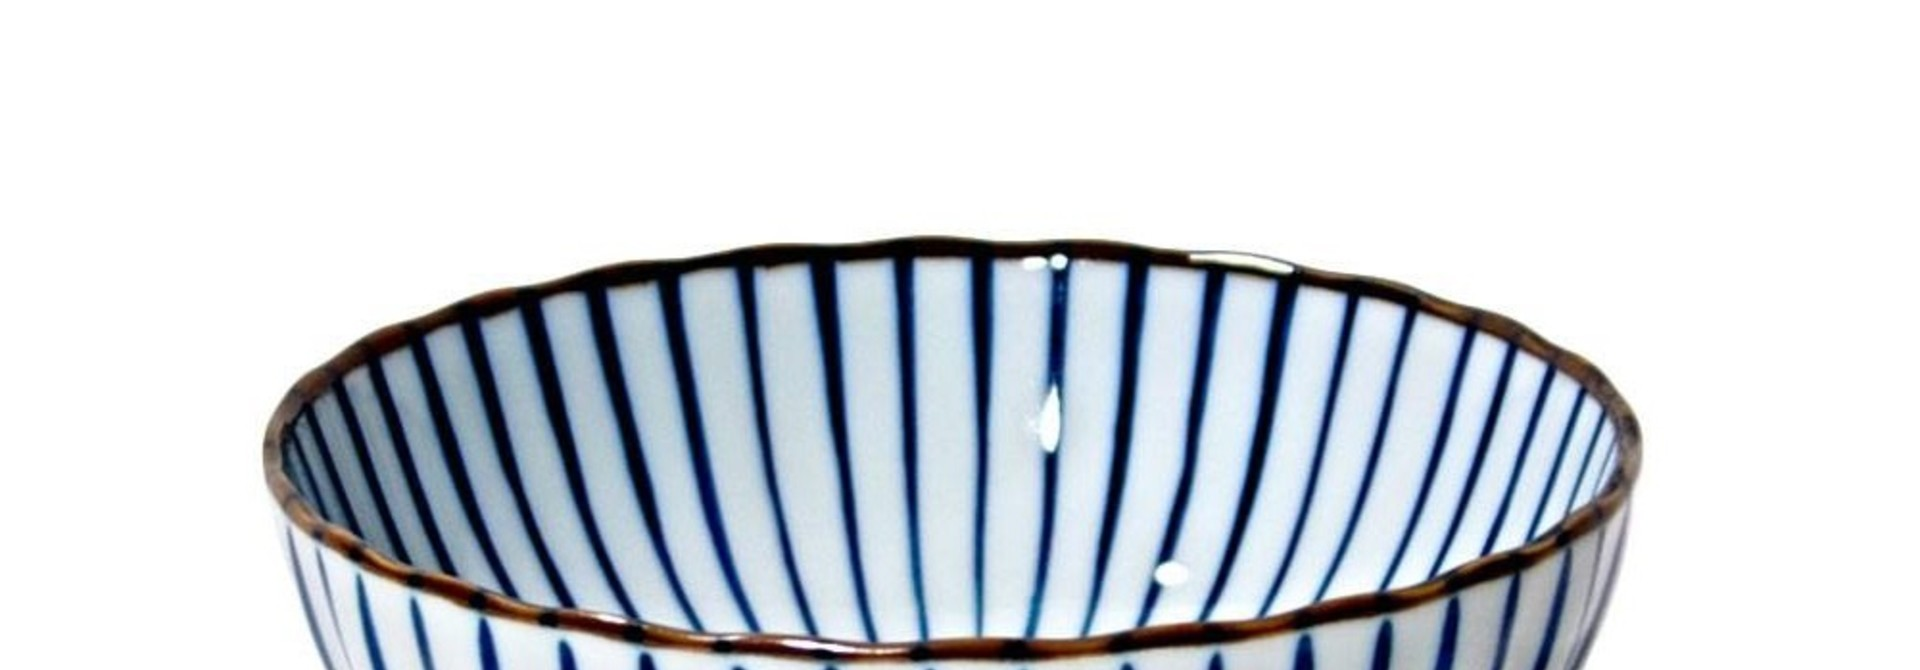 Tokusa - Bowl